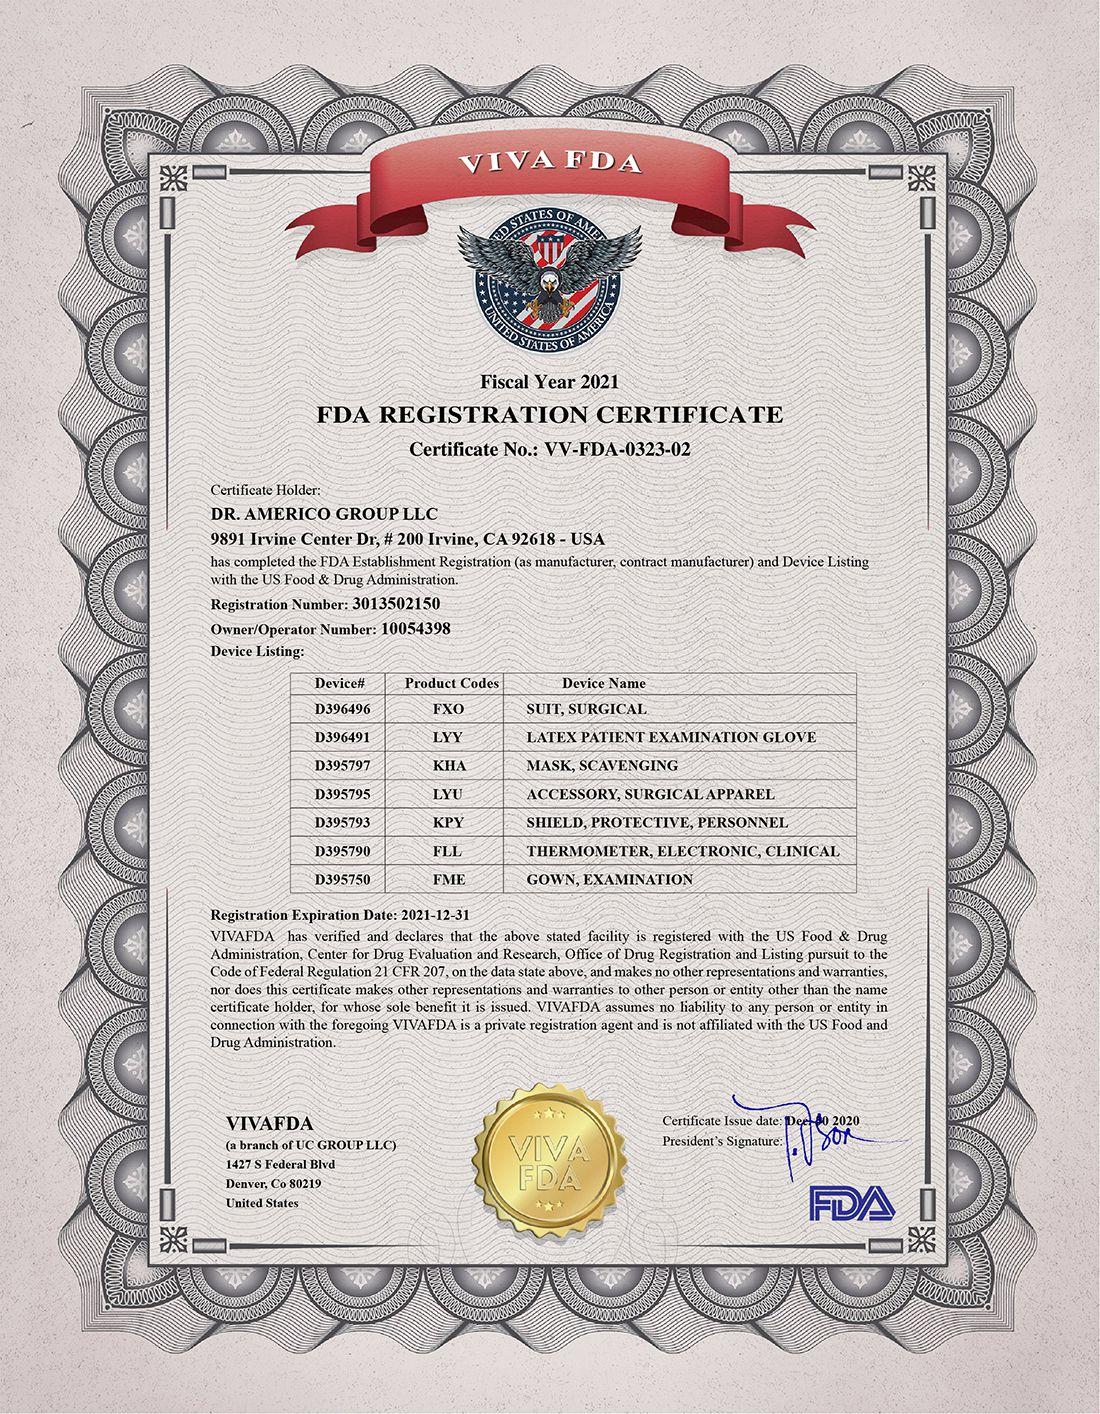 FDA REGISTRATION CERTIFICATE DRAMERICO 2020 01